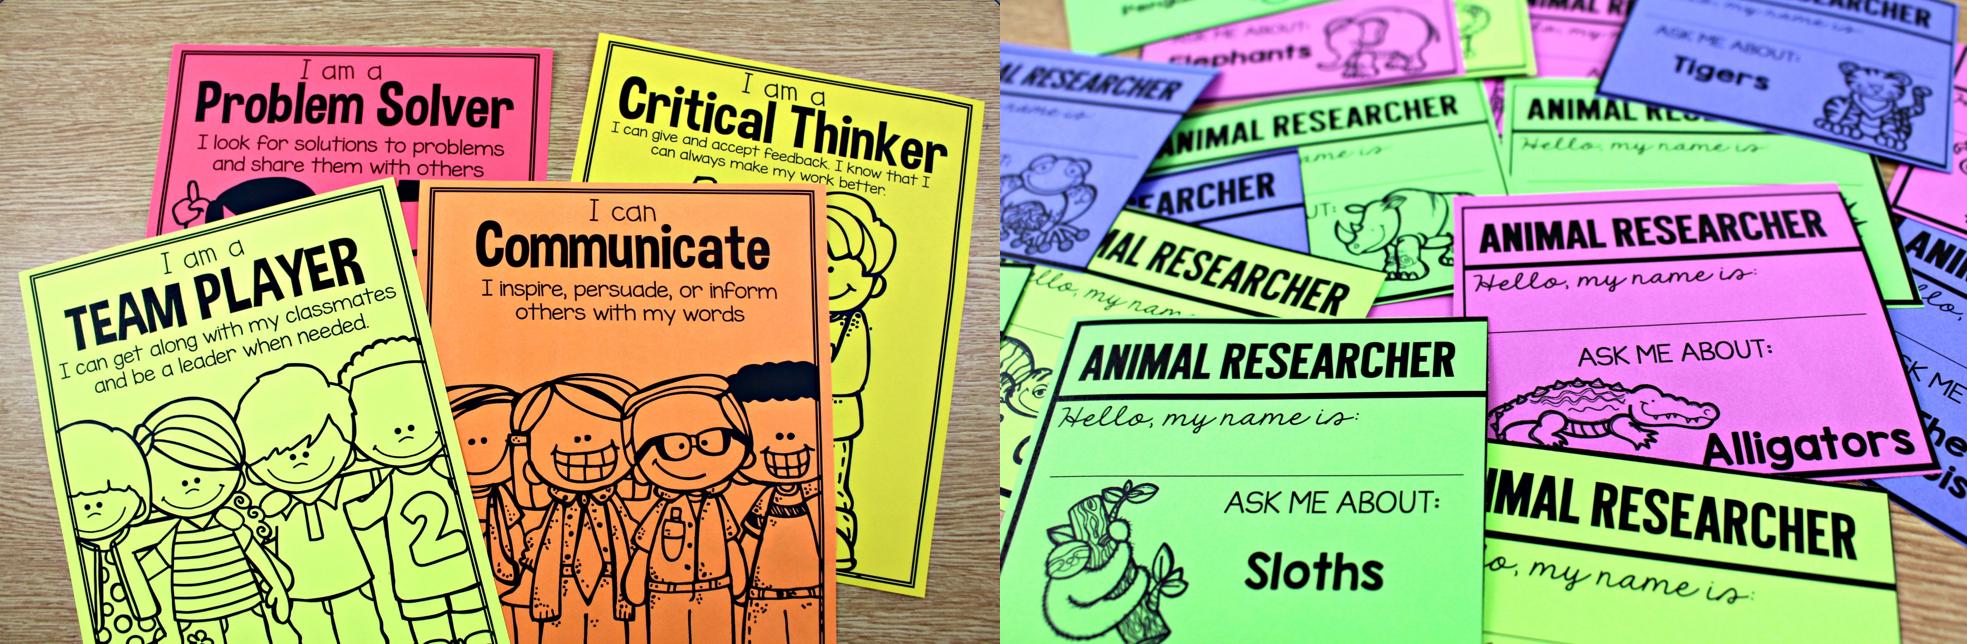 Keynote for ipad visual quickstart guide ebook array animal research creating an ebook tunstall u0027s teaching tidbits rh tunstallsteachingtidbits fandeluxe Gallery